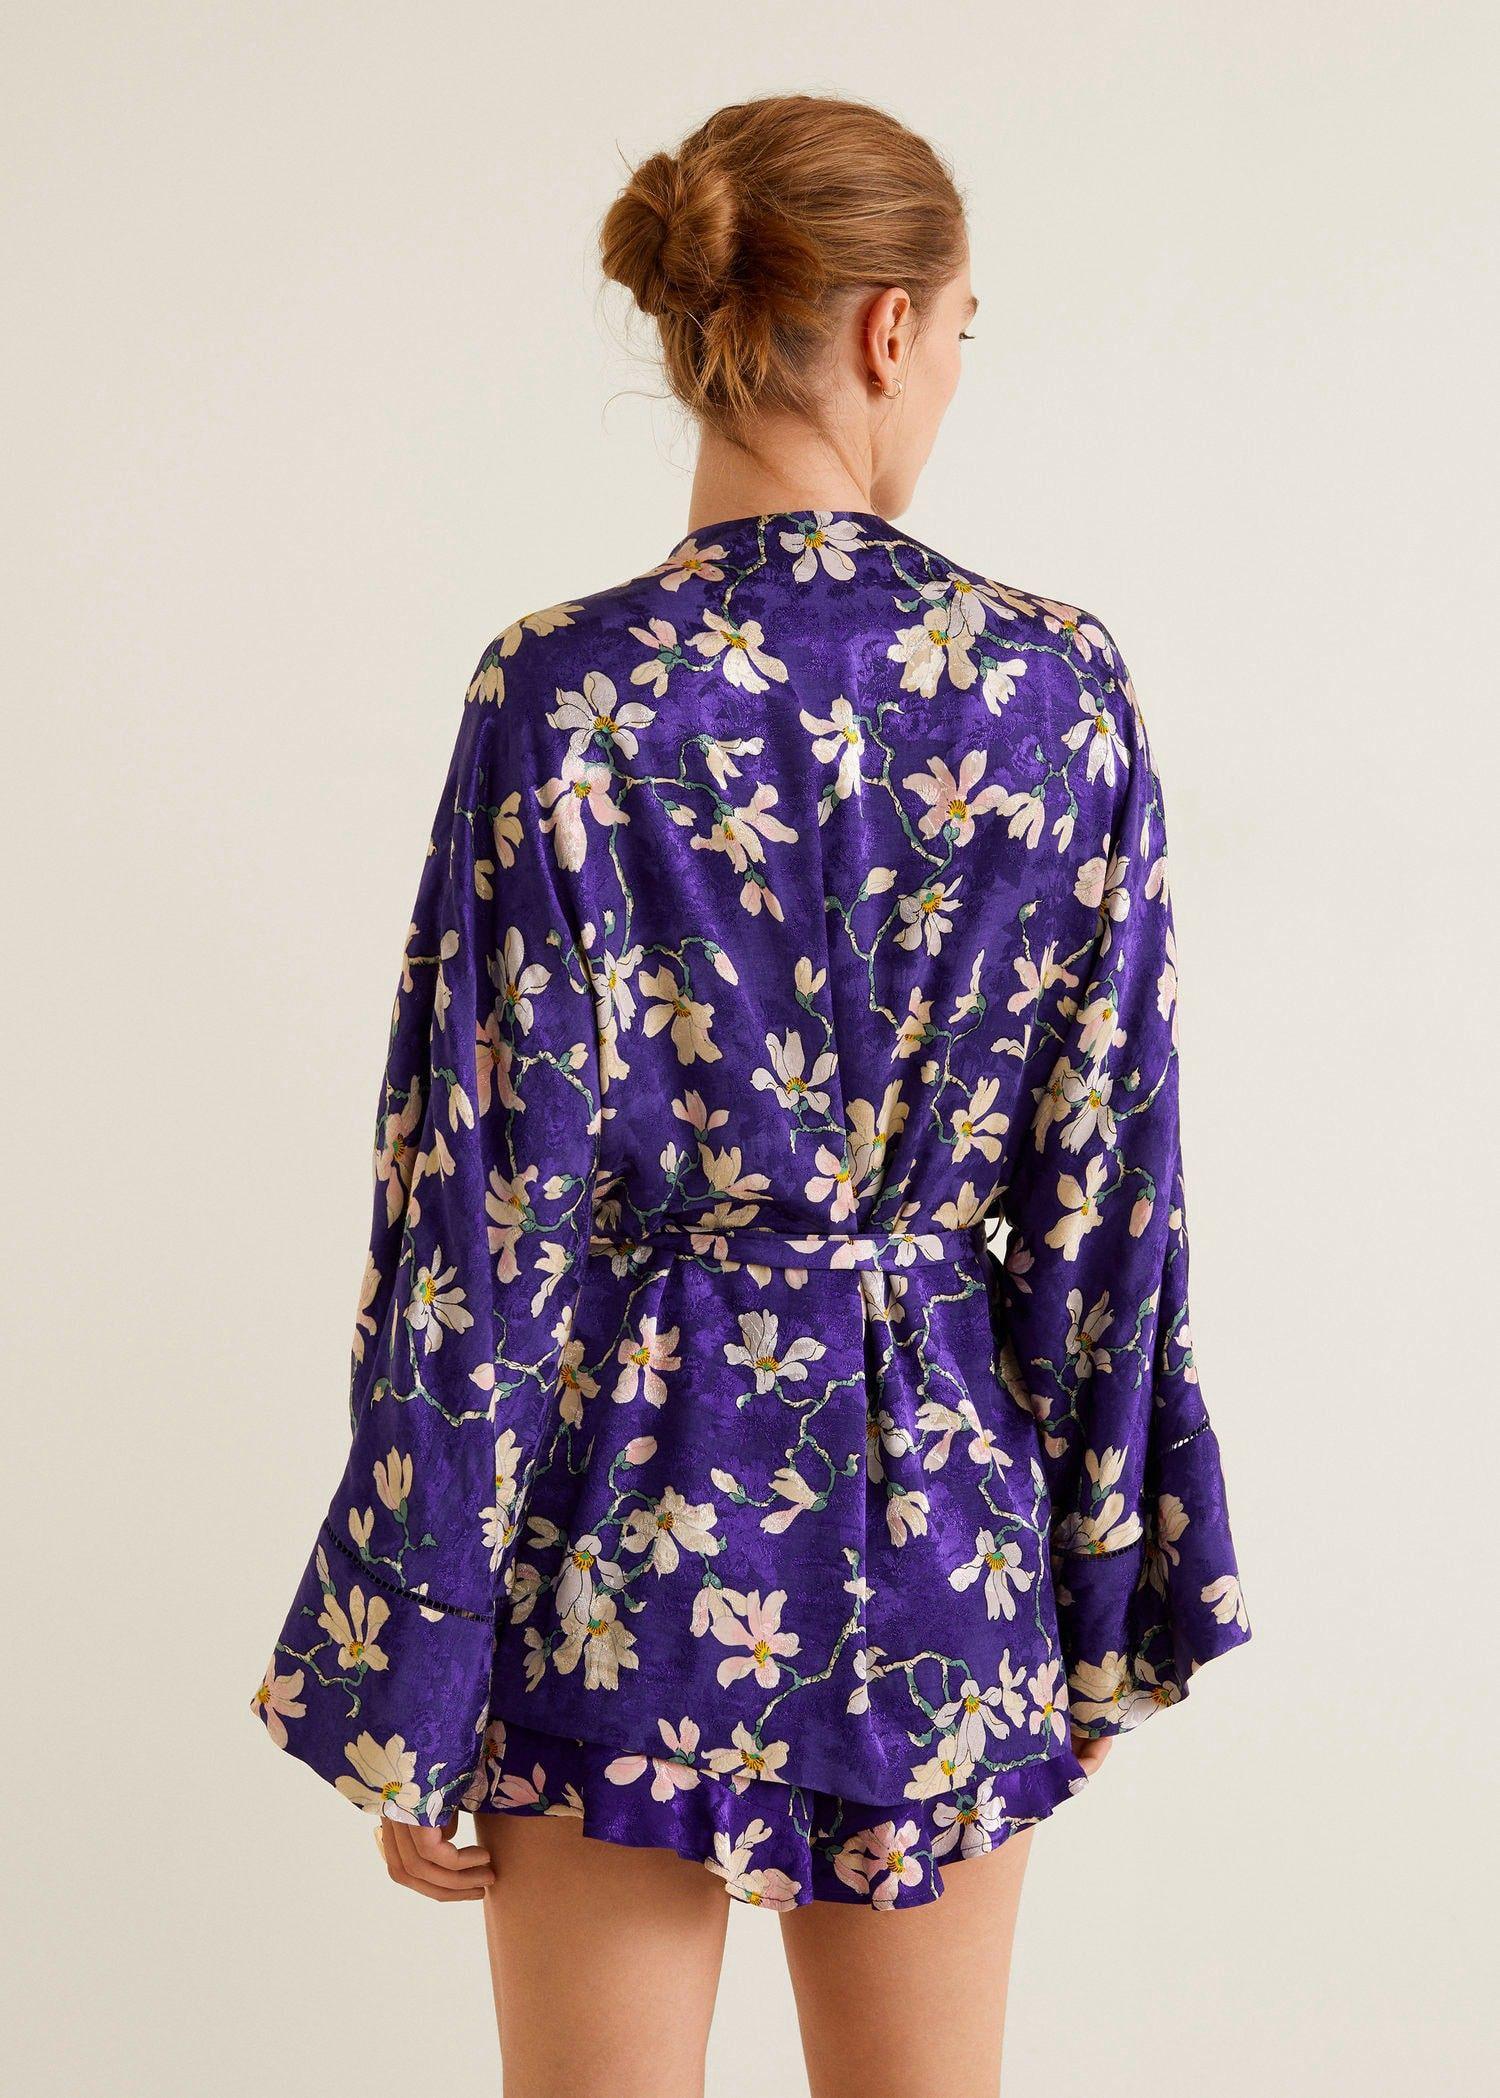 Código promocional tienda del reino unido super popular Mango Floral Print Kimono - Xxs-Xs | Products | Floral prints ...